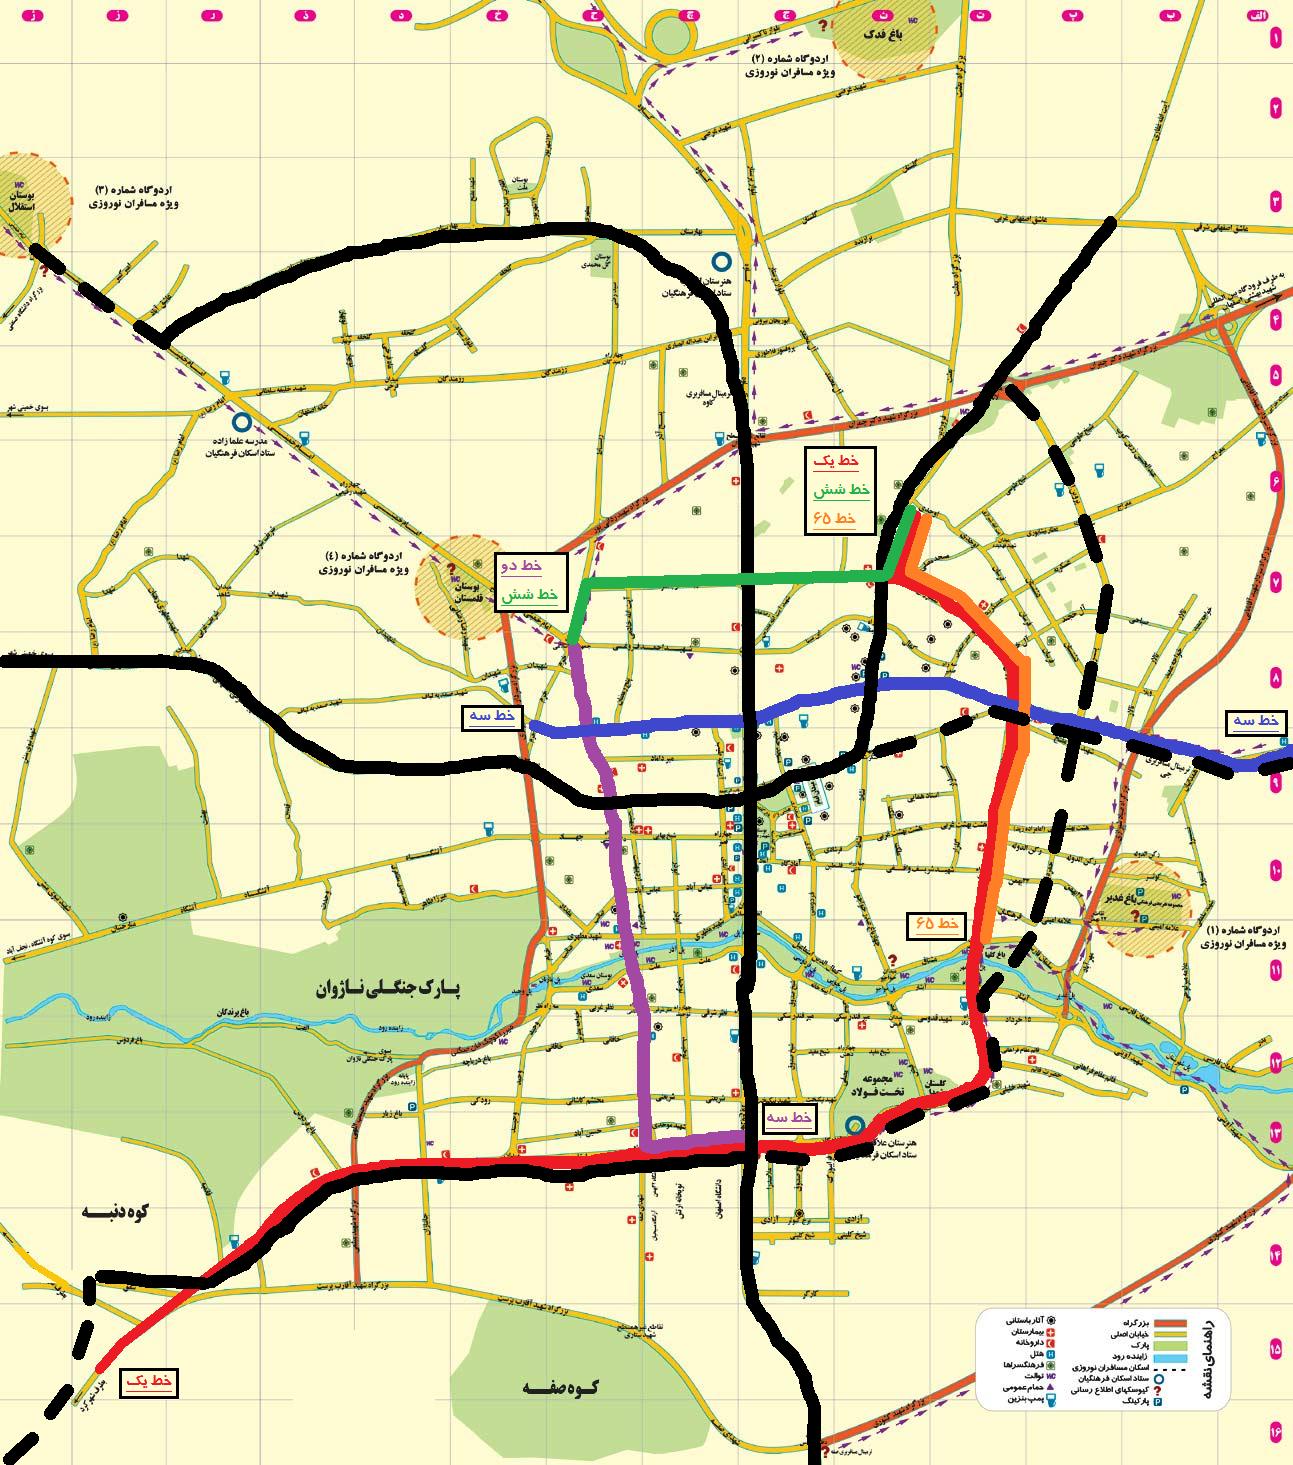 Esfahan] Bus Rapid Transit - SkyscraperCity